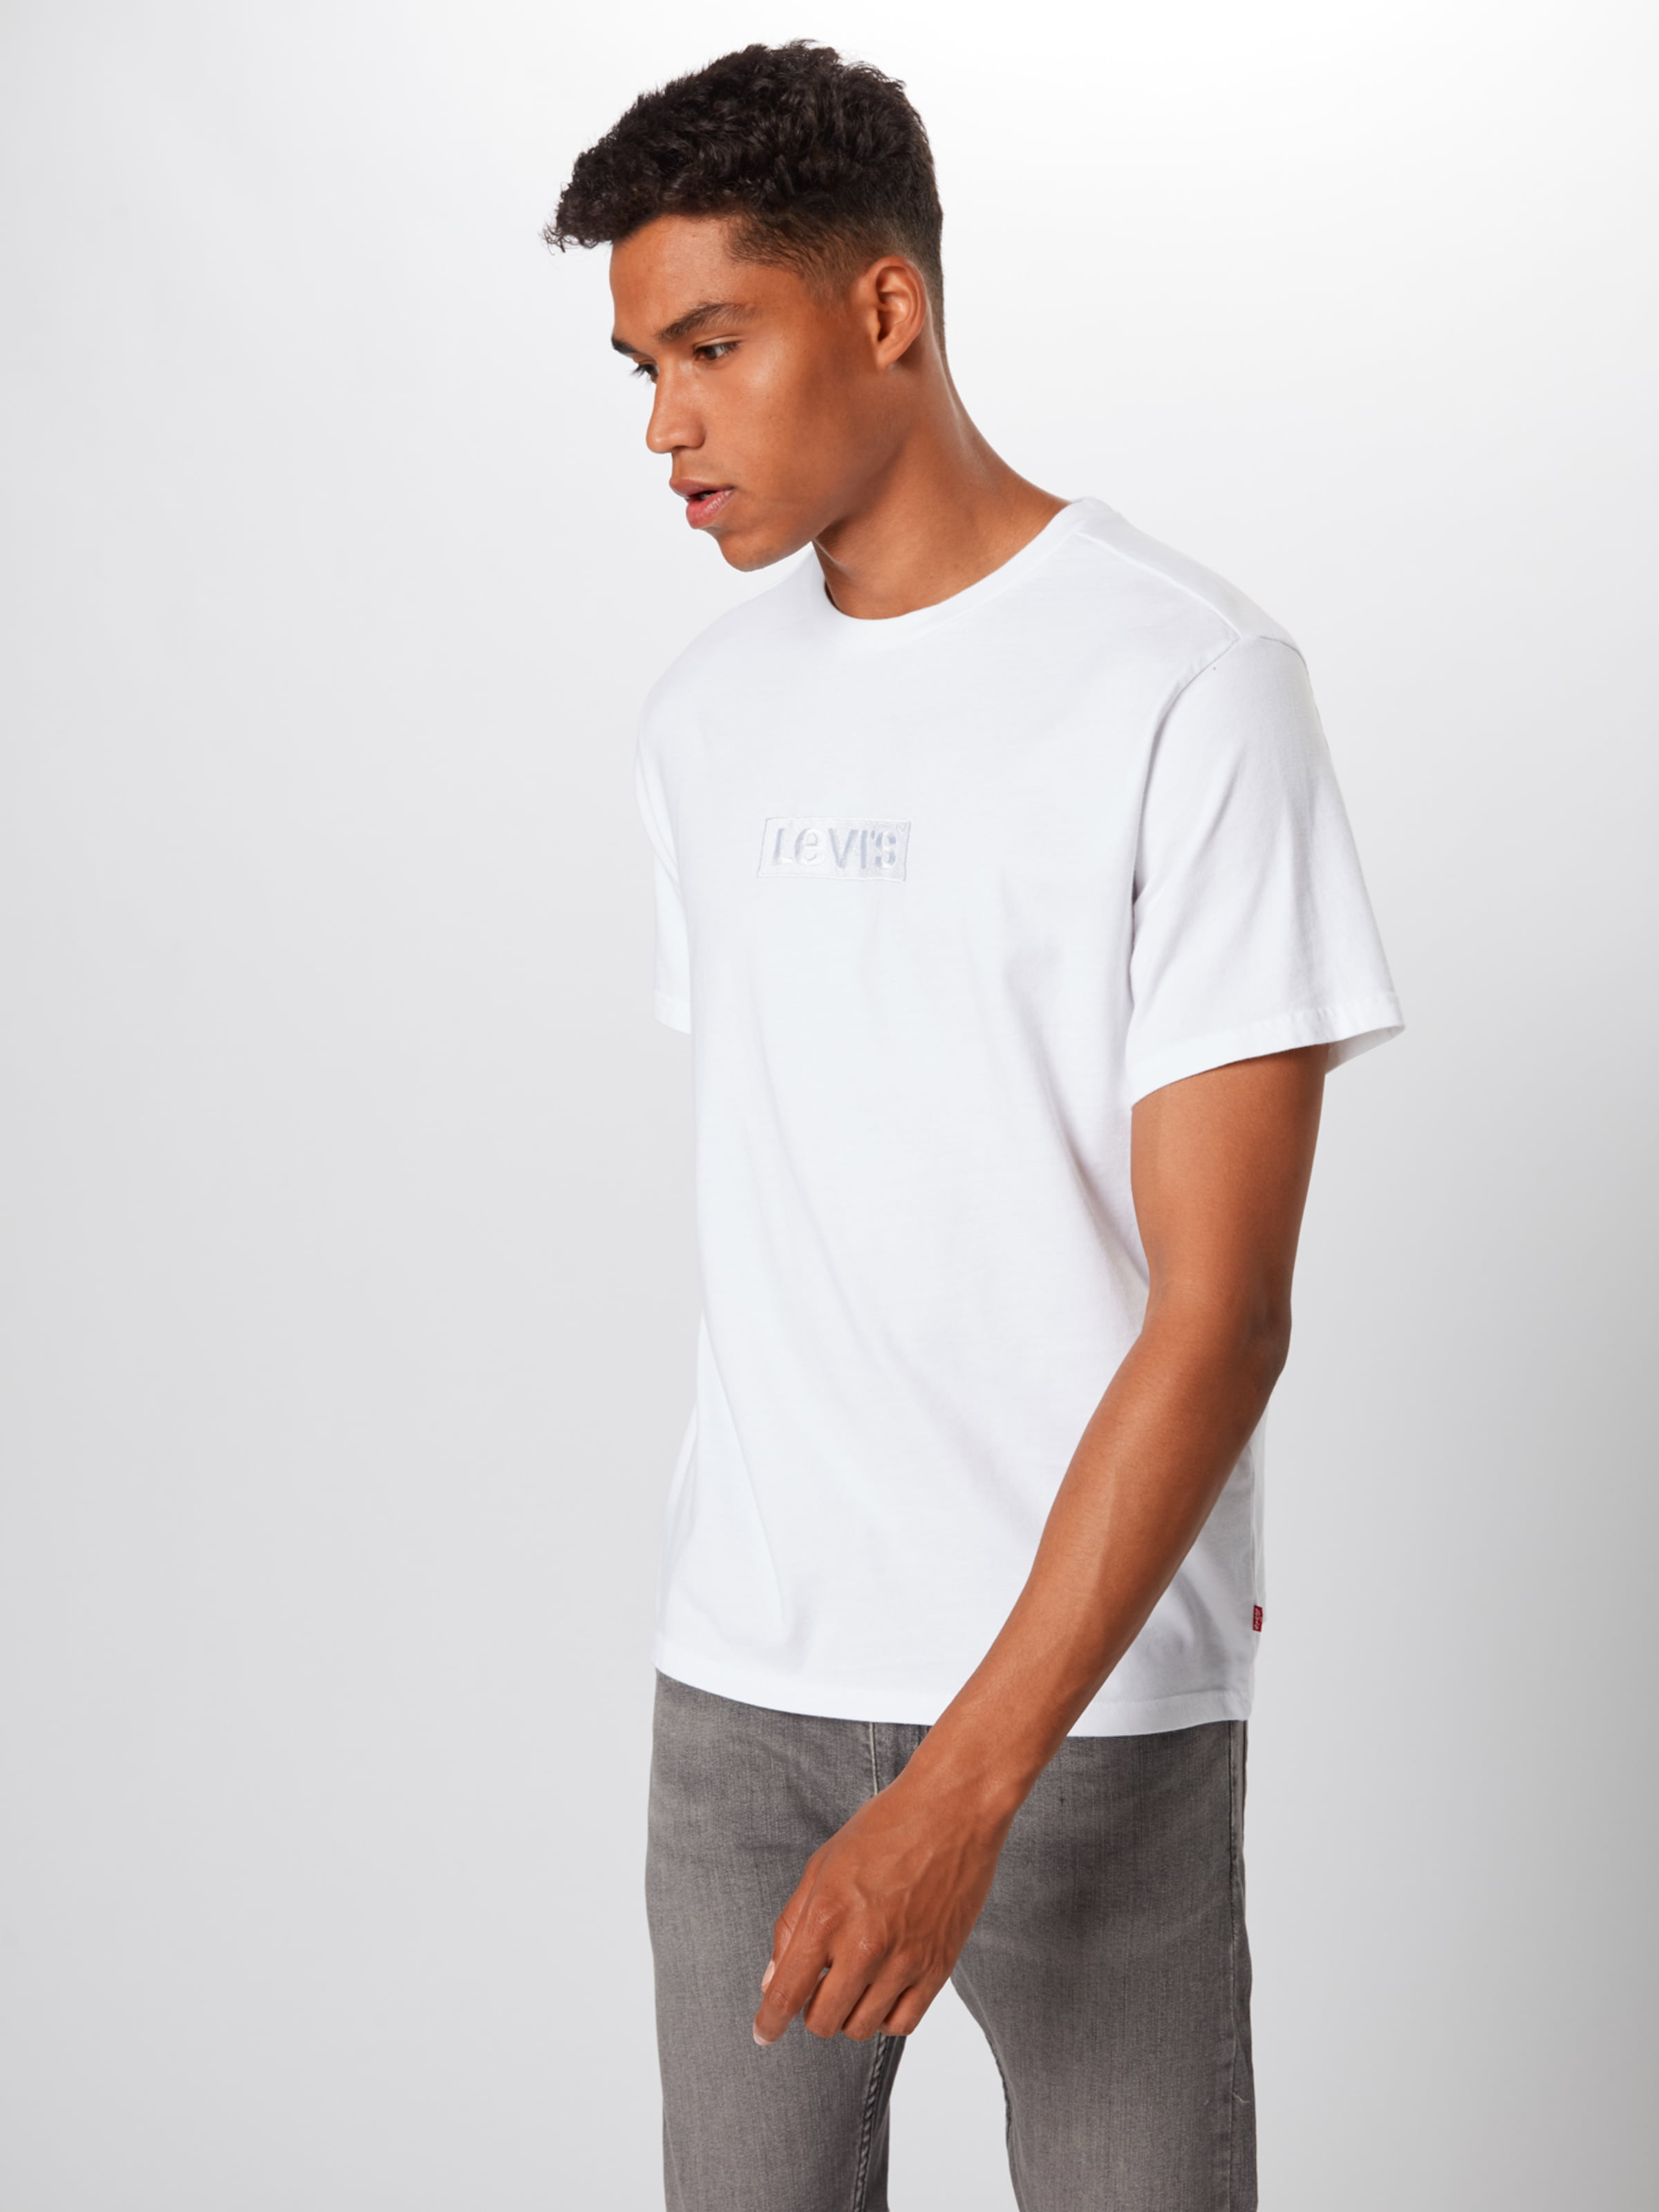 Levi's Blanc Levi's T En shirt hdtCQsr